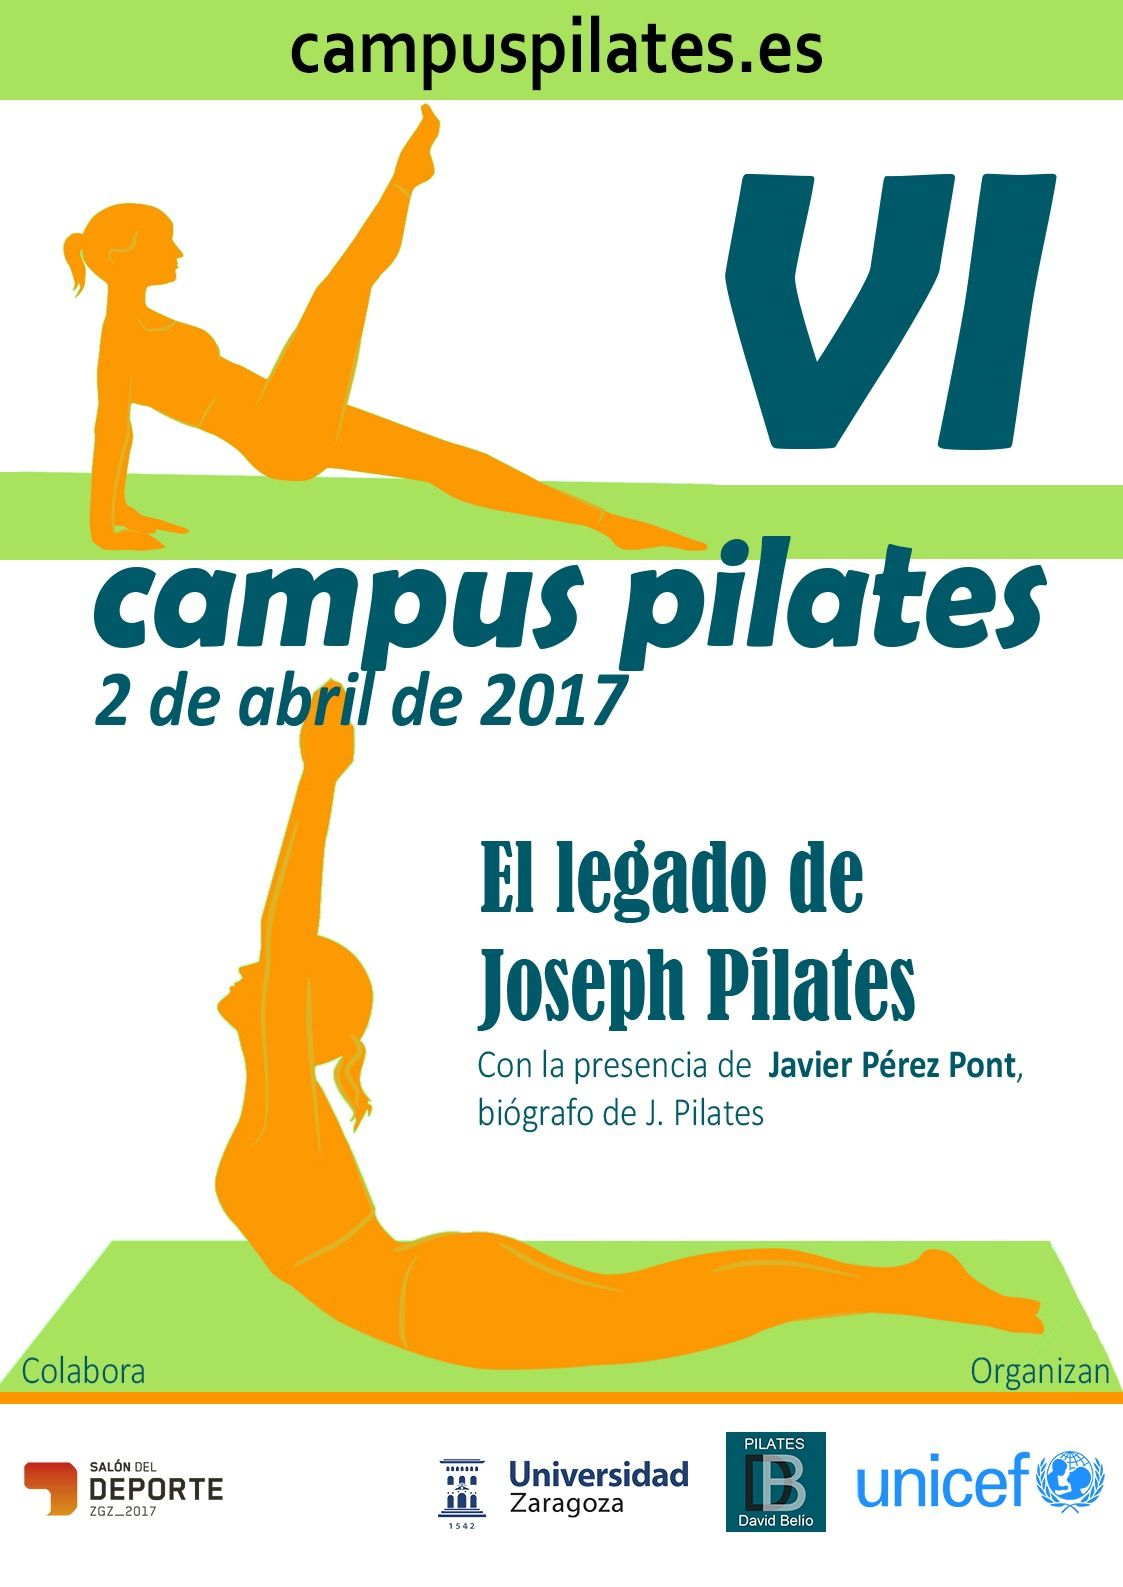 el legado de Joseph Pilates